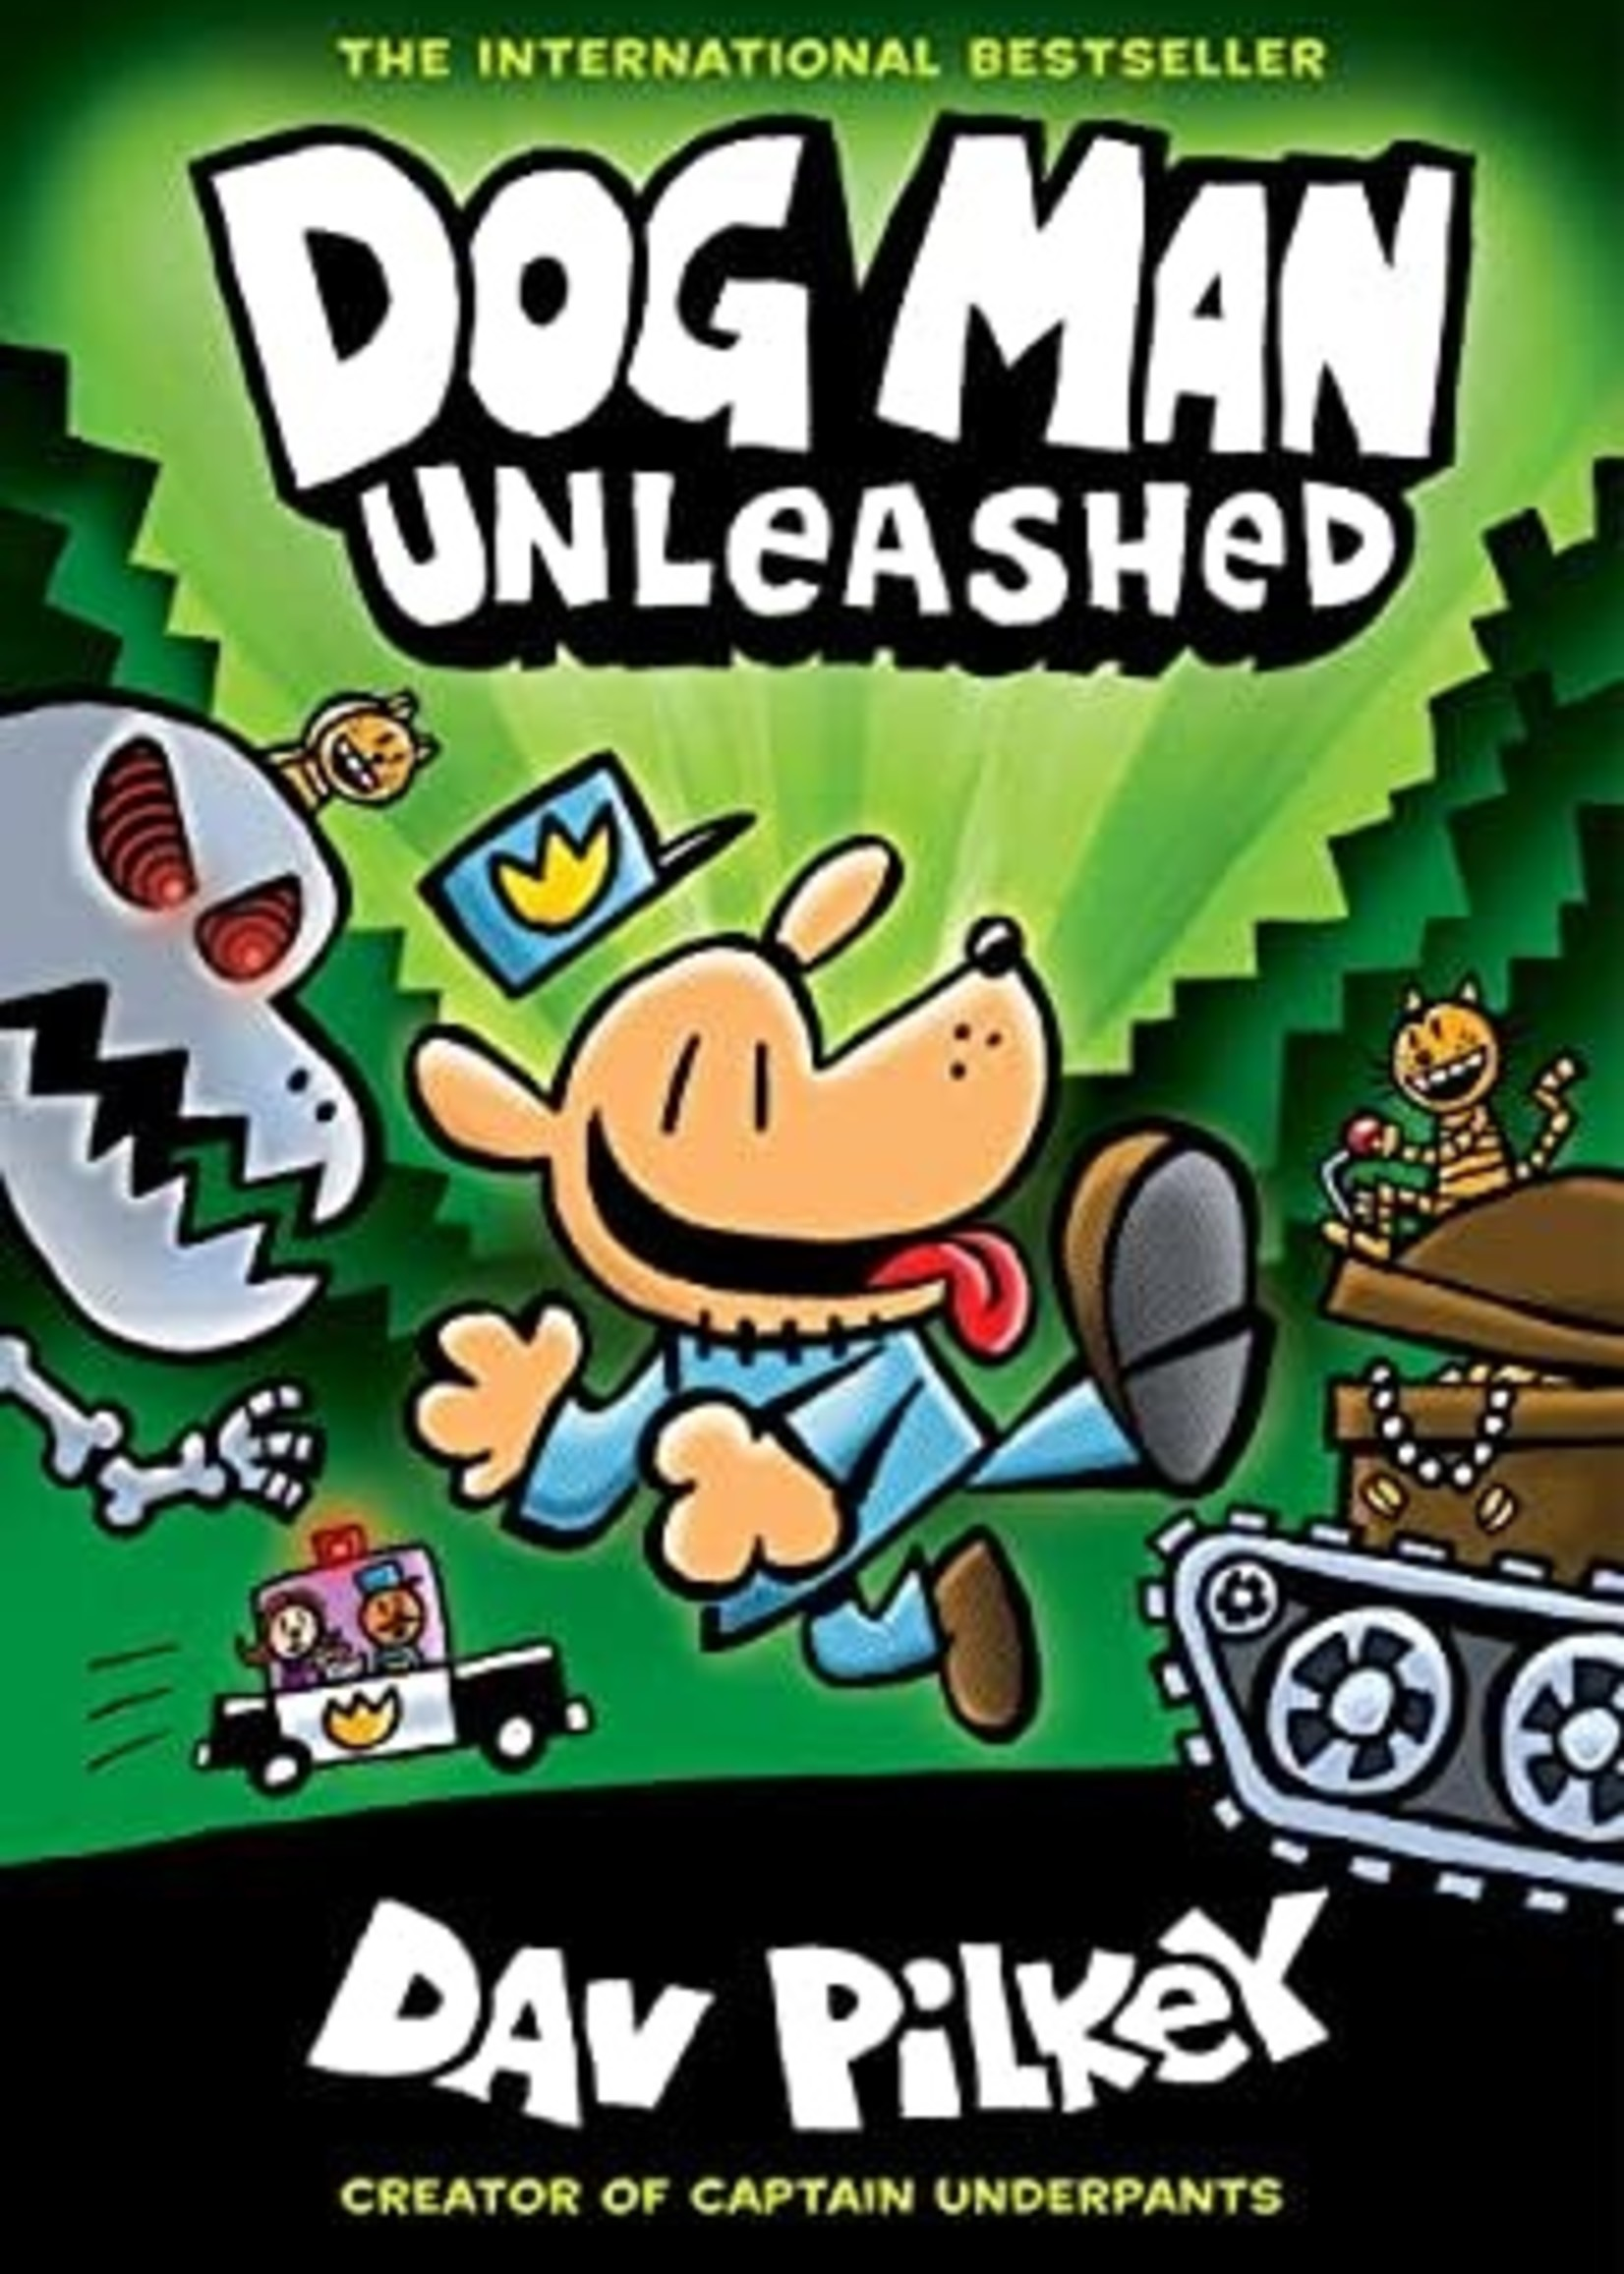 Dog Man Unleashed (Dog Man #2) by Dav Pilkey